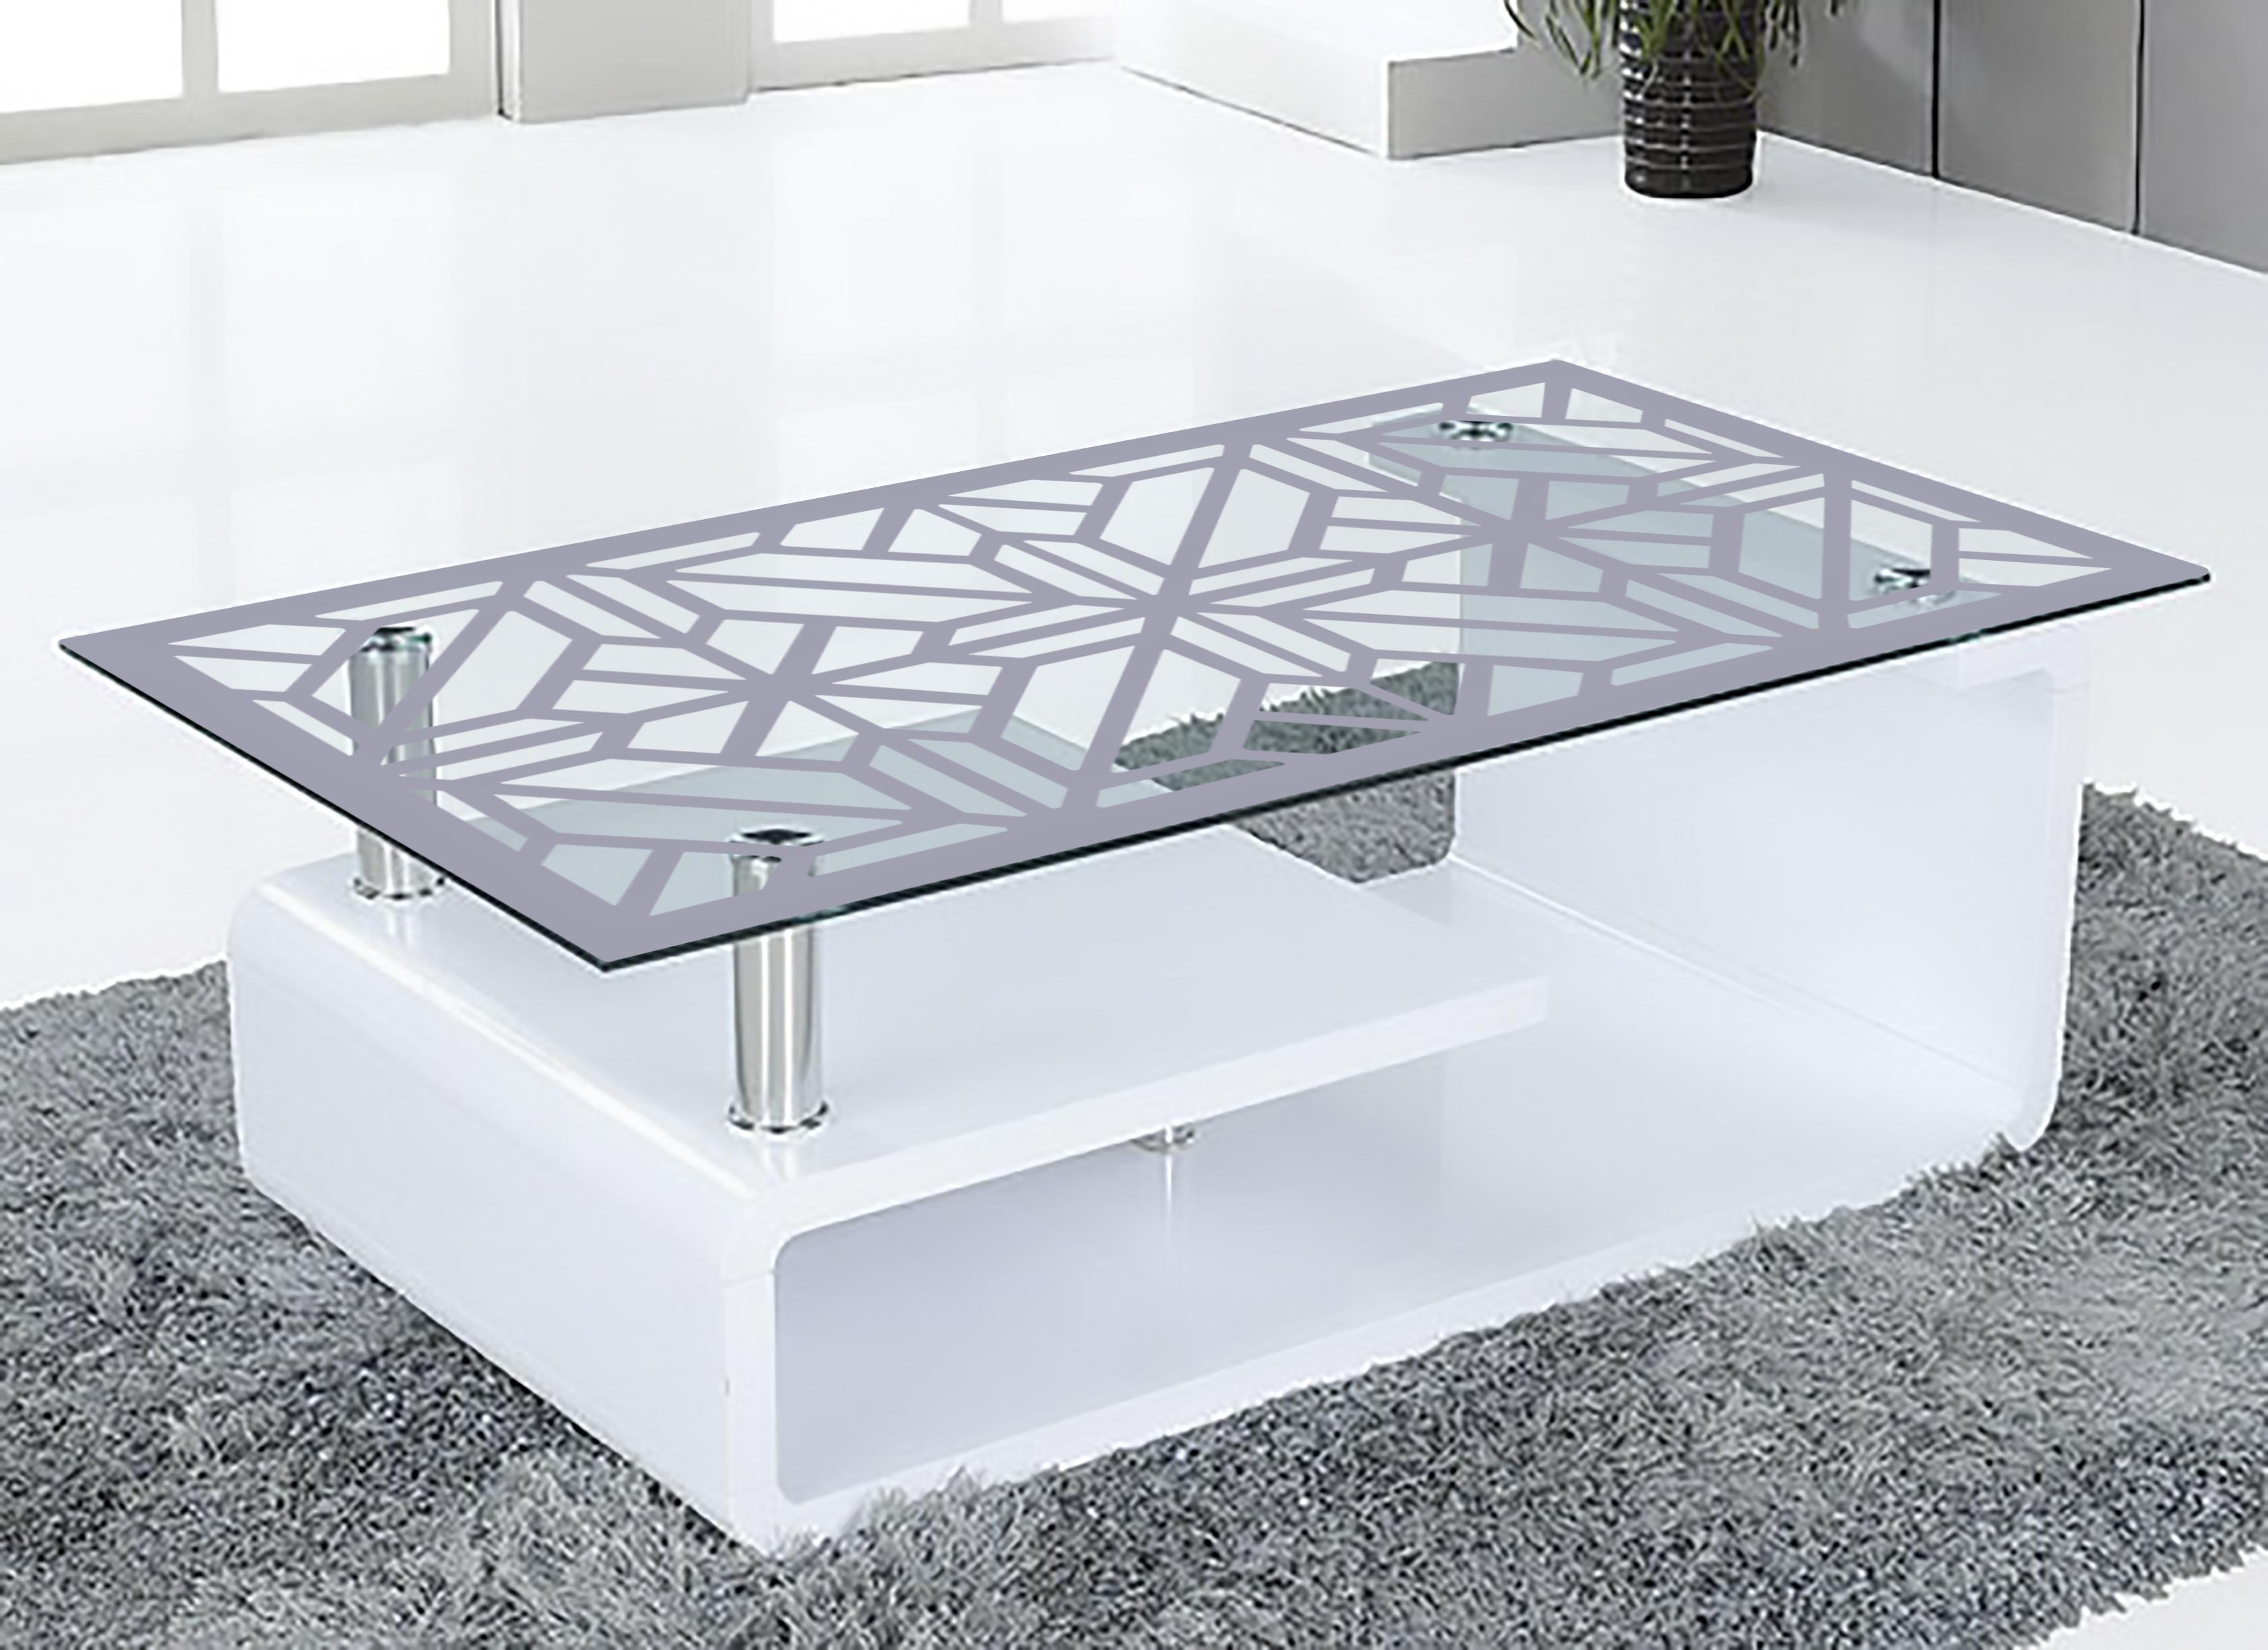 Glass Designer Table Tescar Innovations2019 Org